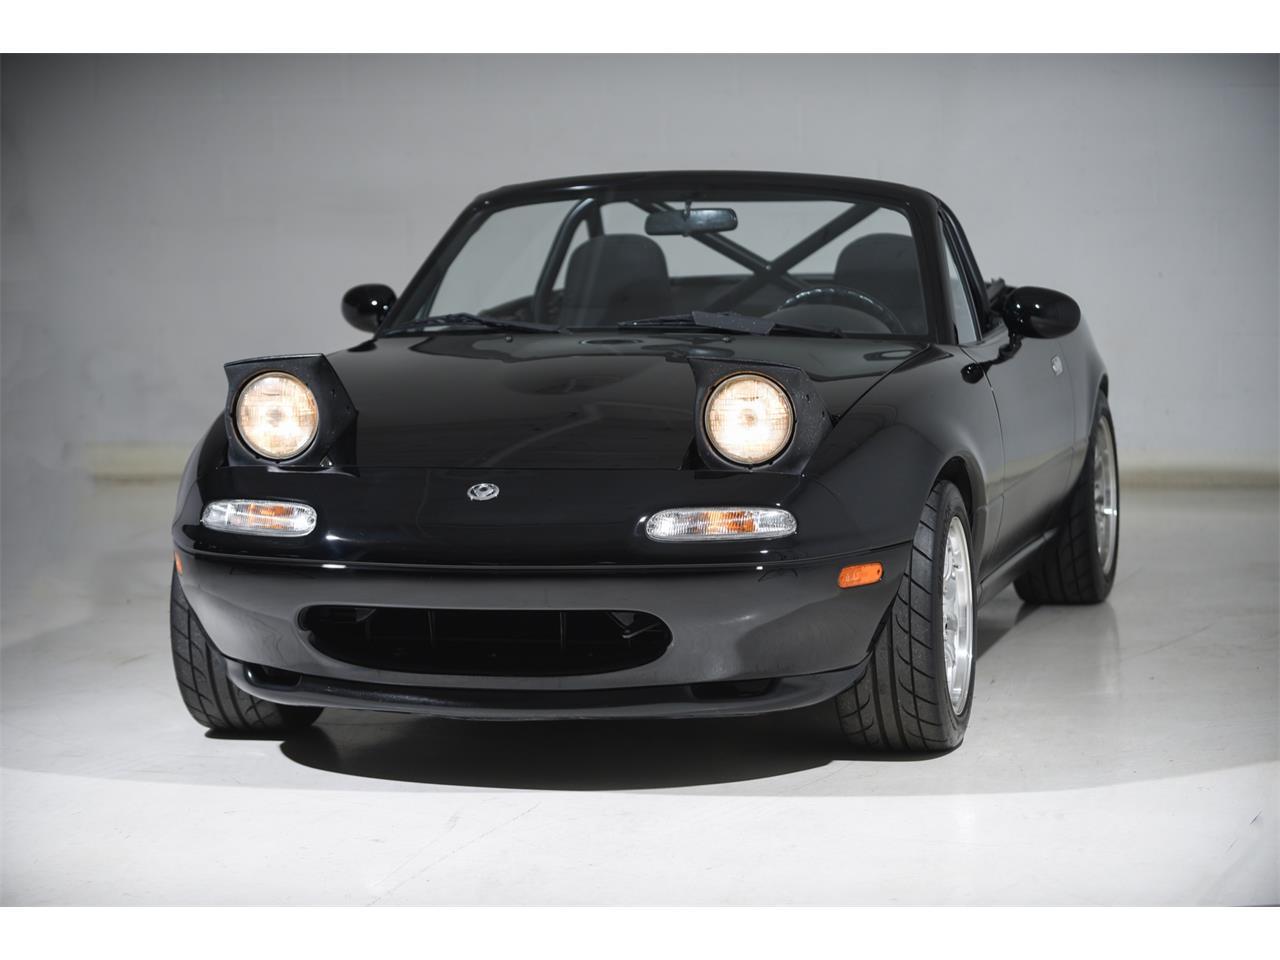 1994 Mazda Miata (CC-1210209) for sale in Farmingdale, New York